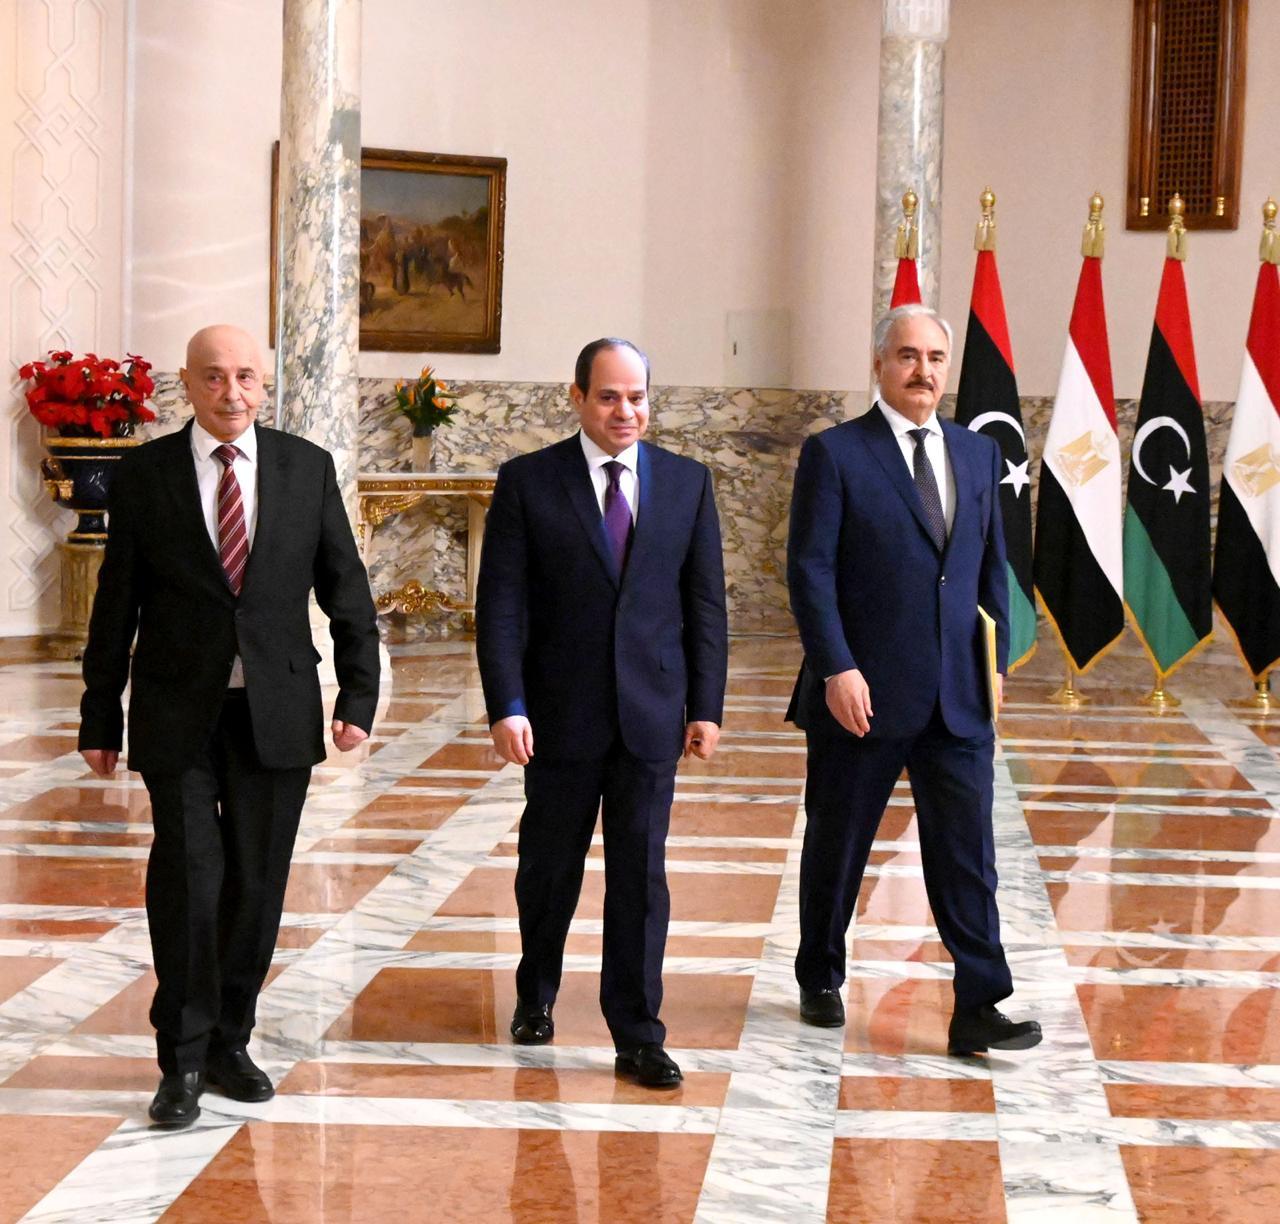 Sisi with Saleh and Haftar